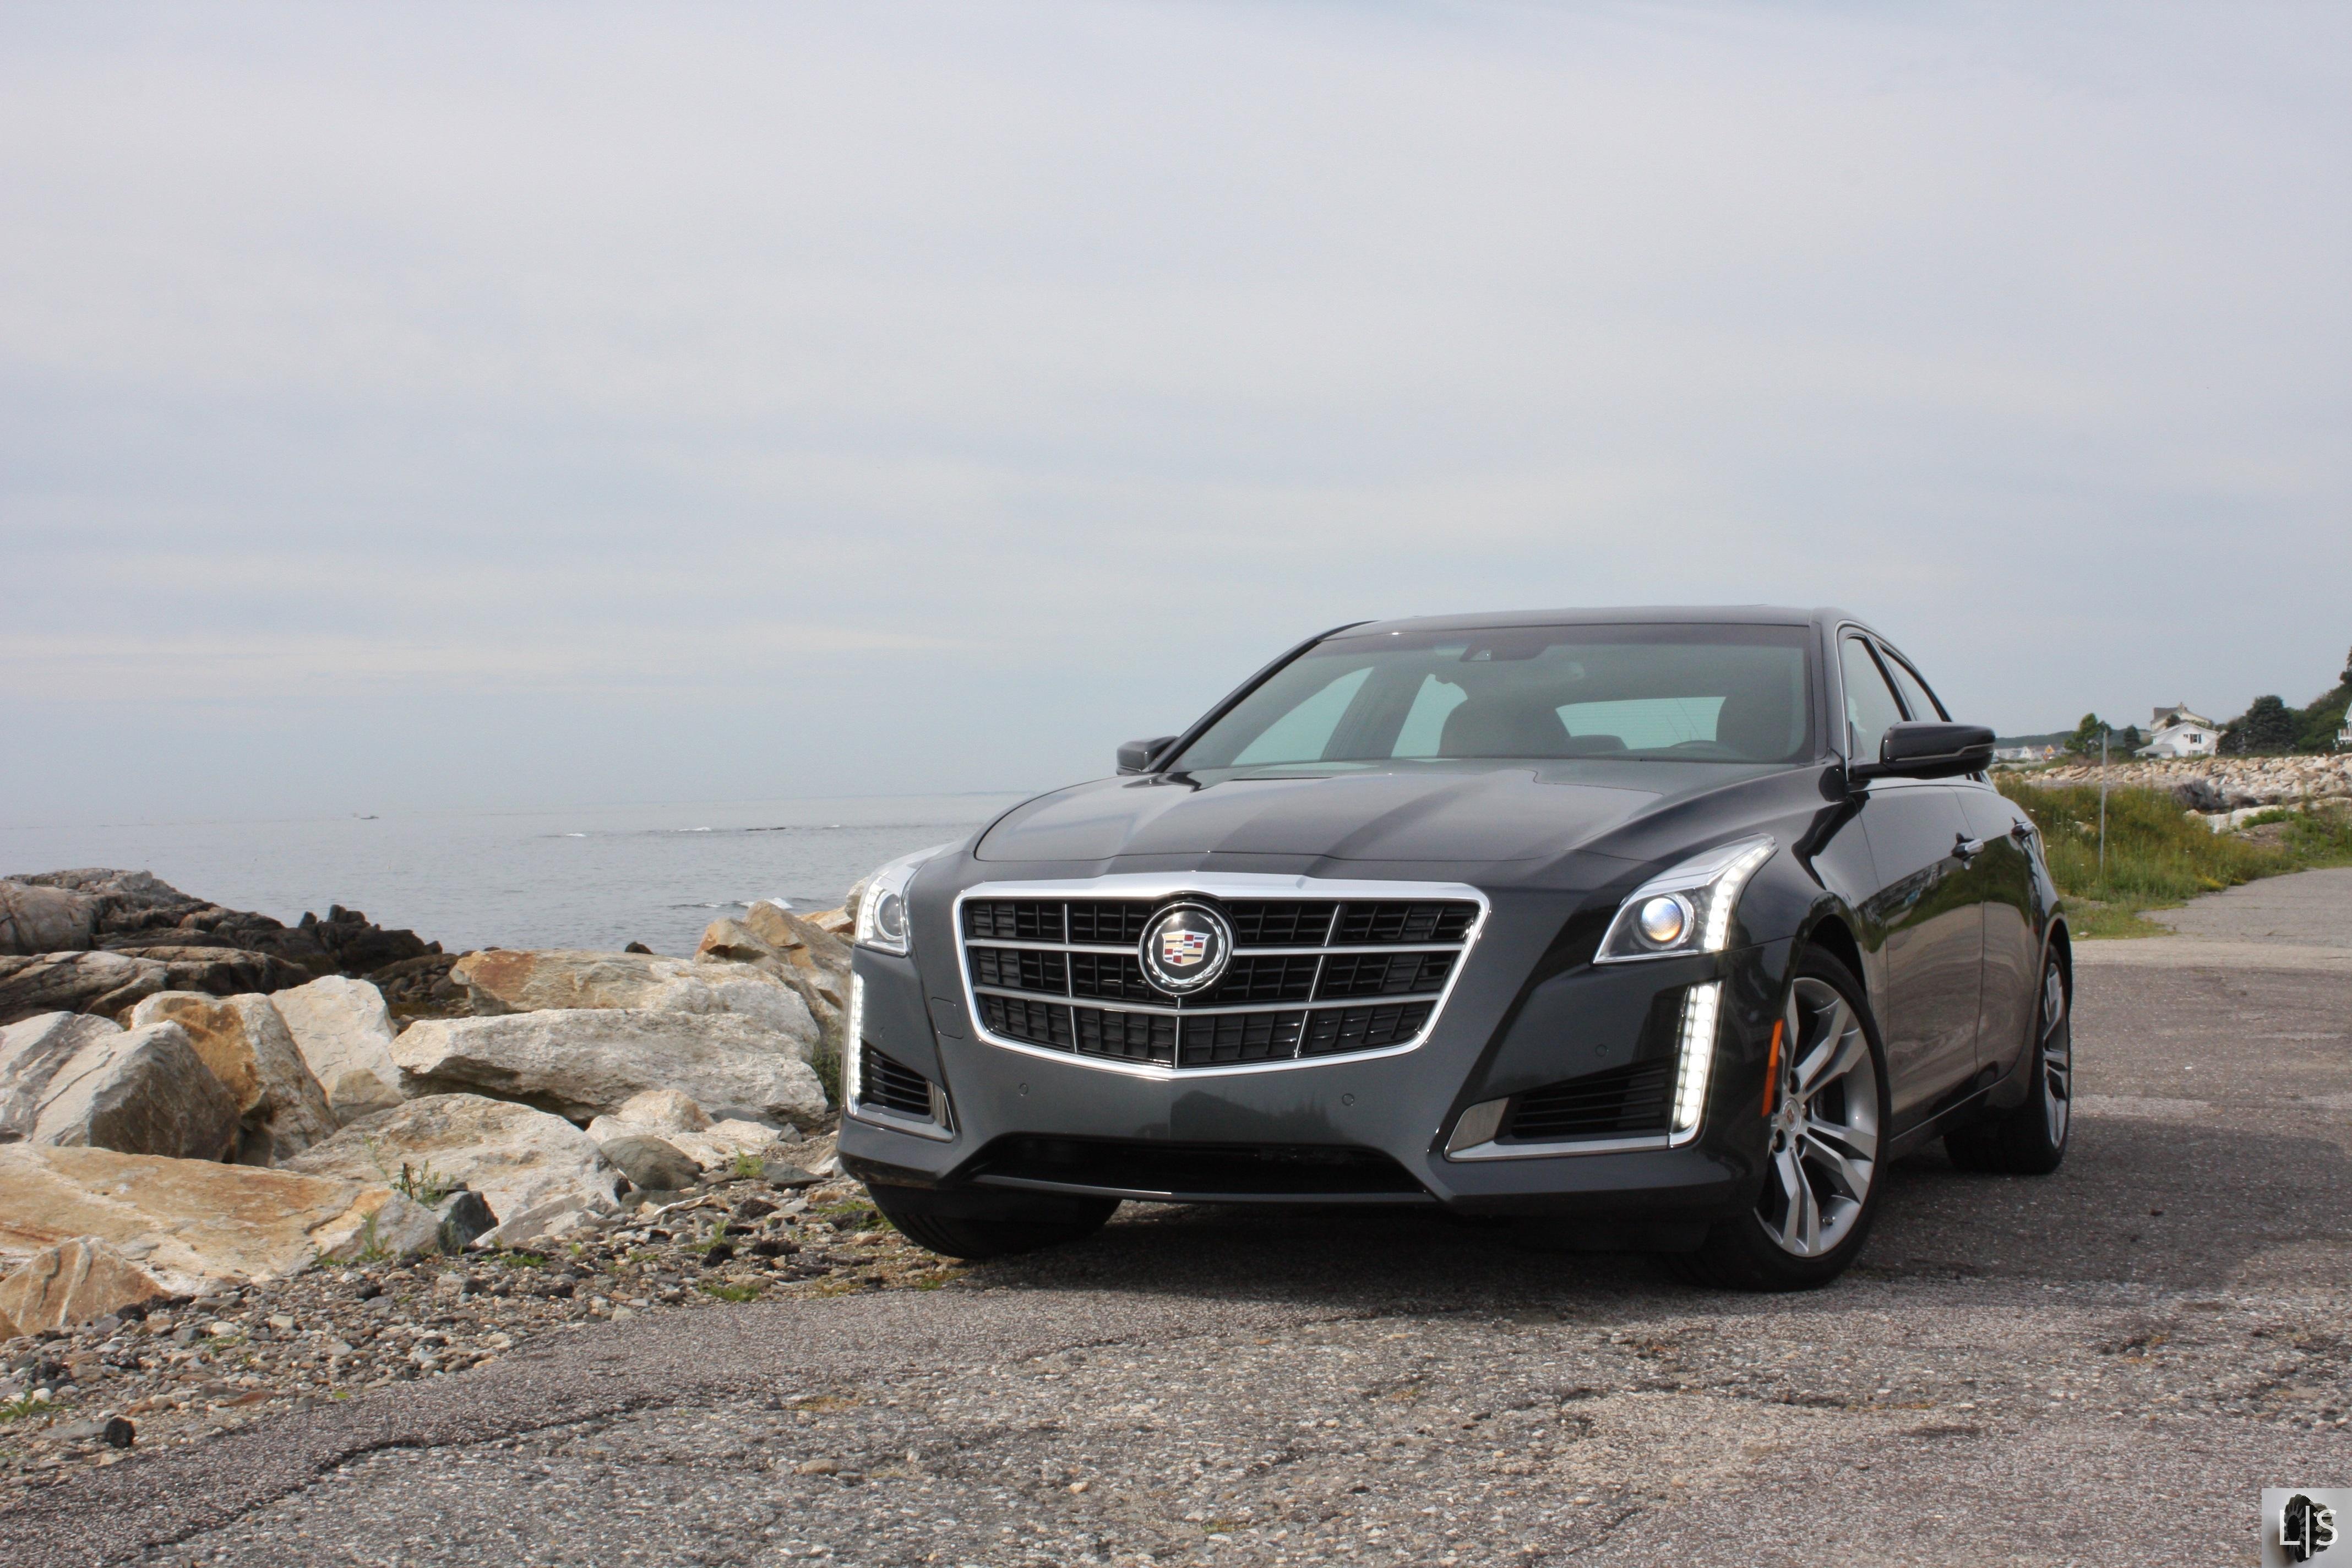 cts car article lauren wagon cadillac sport fix crossover srx reviews